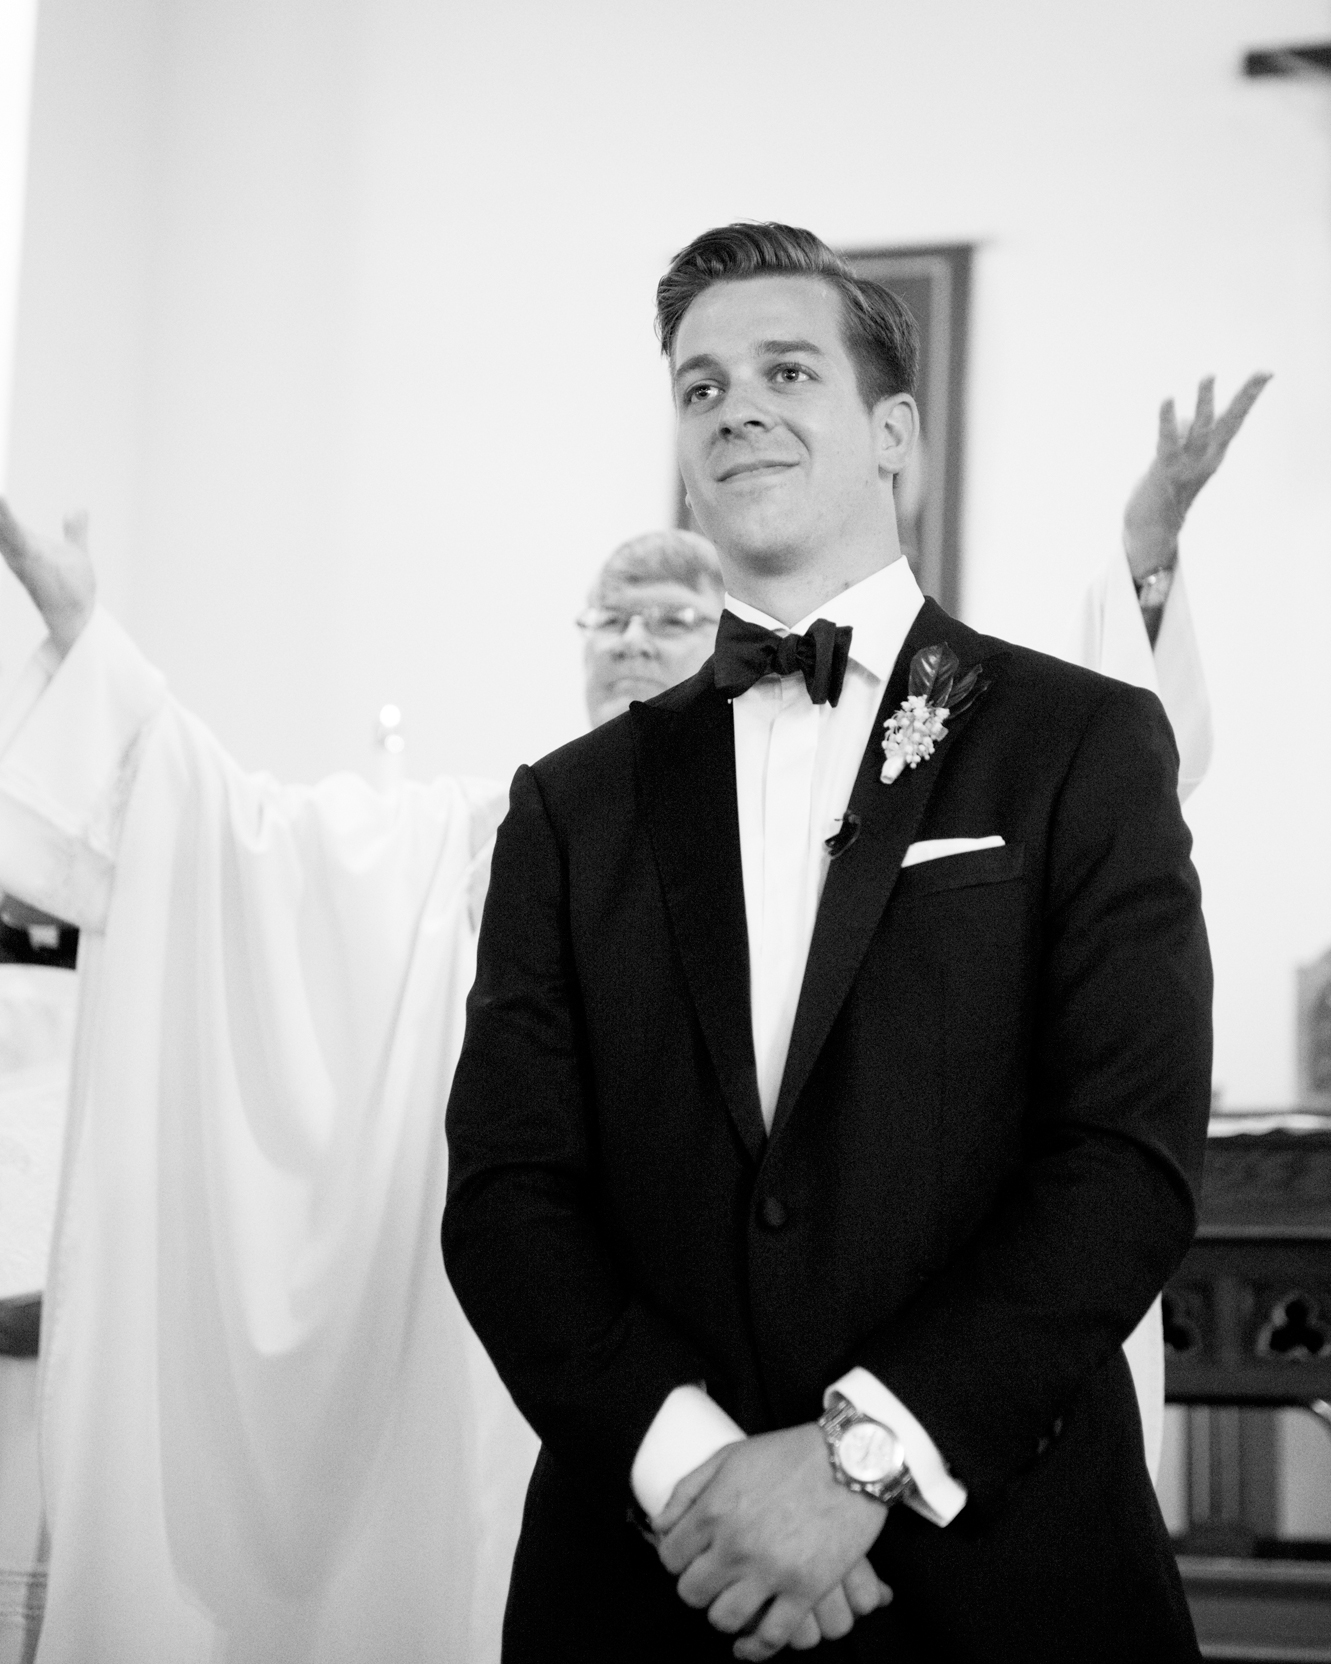 taylor-john-wedding-ceremony-139-s112507-0116.jpg